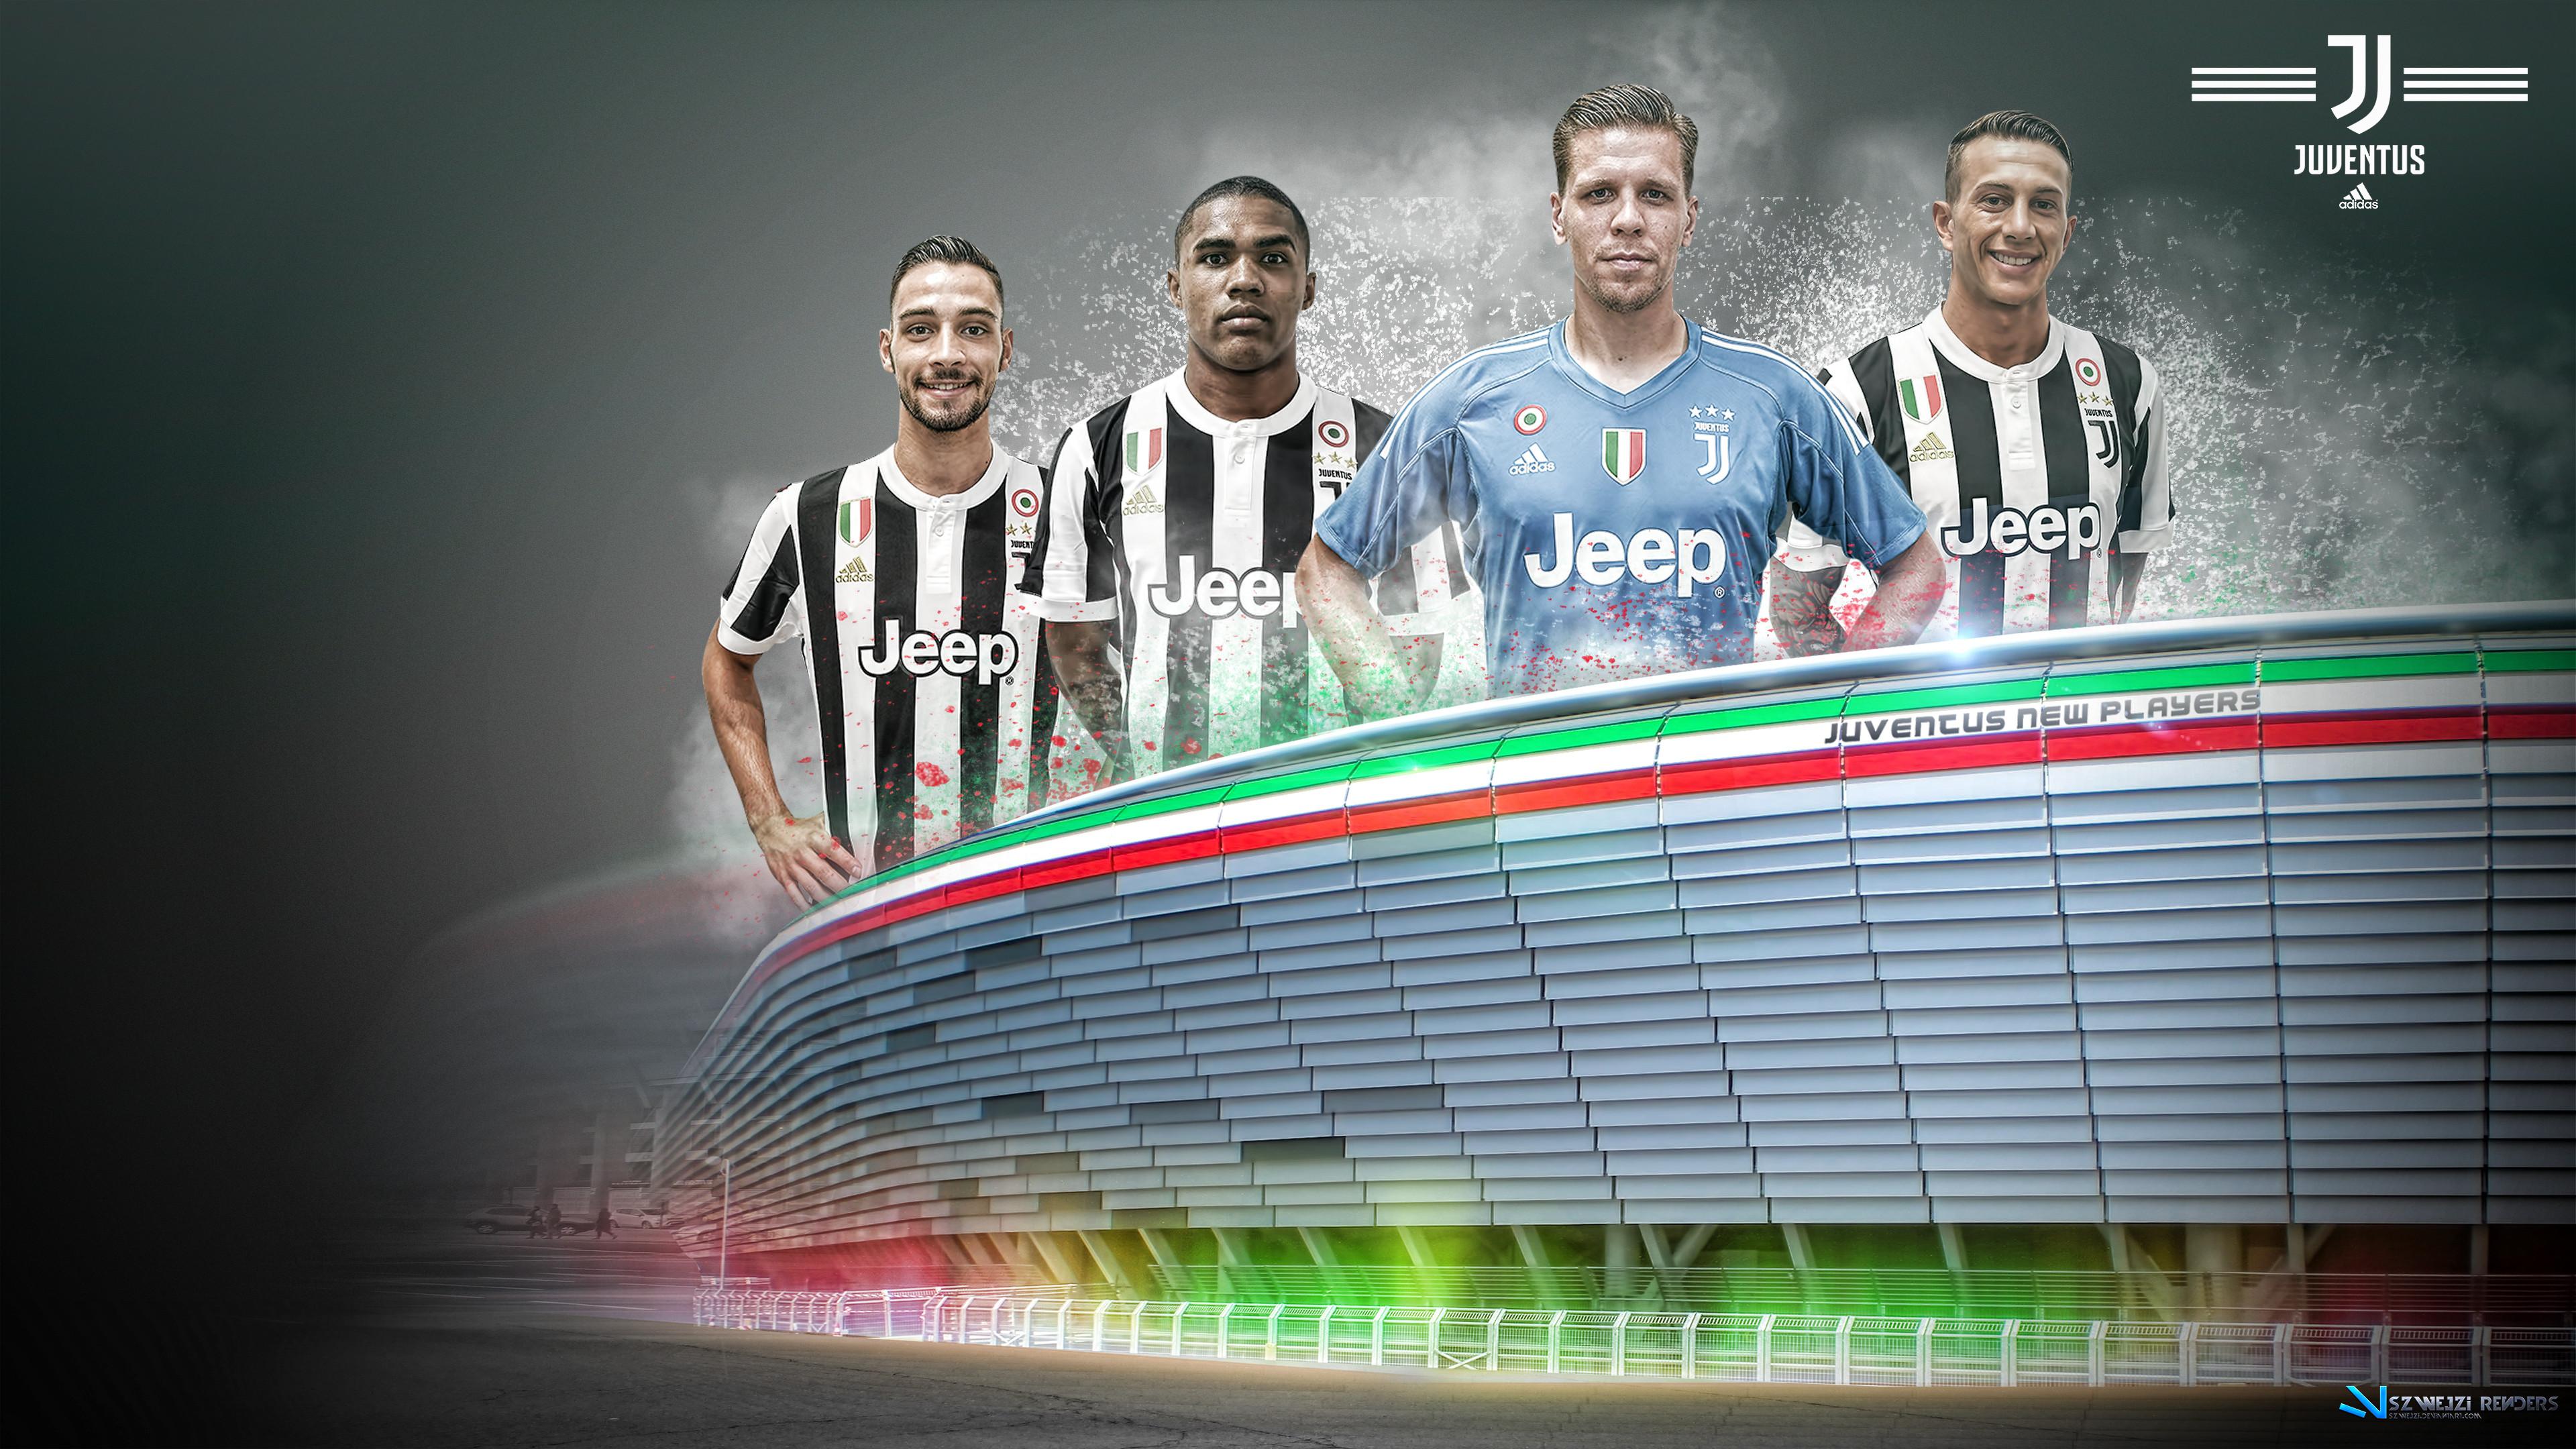 Liverpool Live Wallpaper Iphone Logo Juventus Wallpaper 2018 75 Images